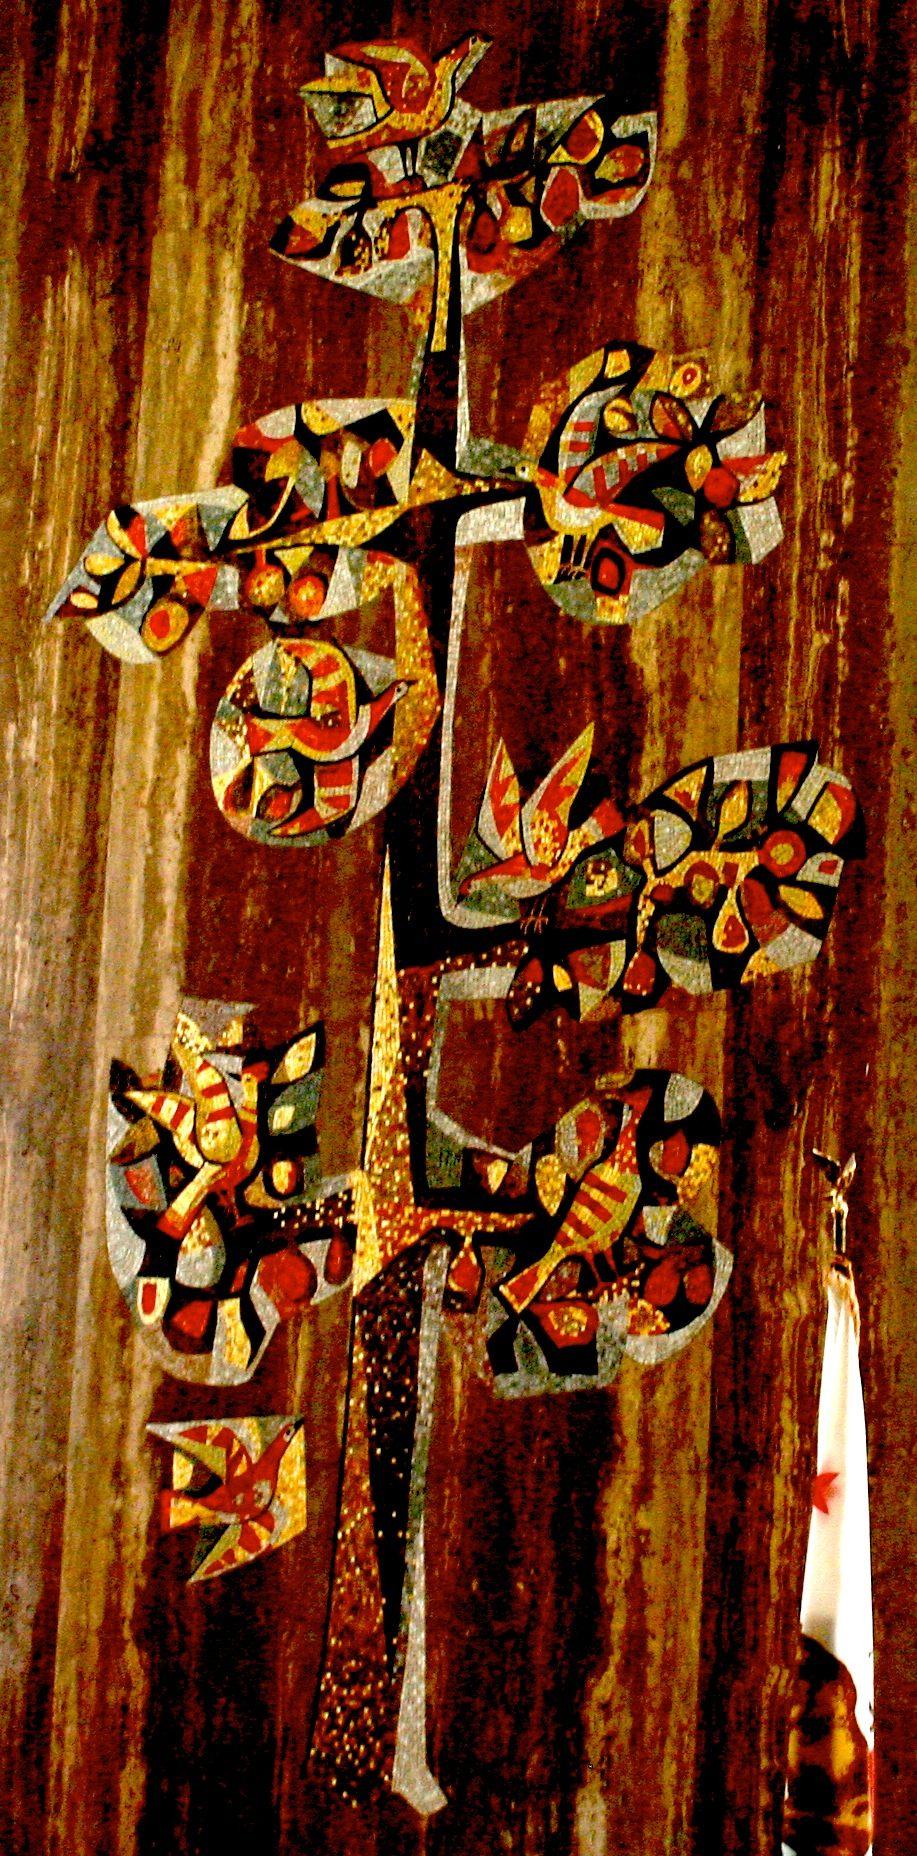 Jean and Arthur Ames, tree mosaic for Ahmanson Trust, 9145 Wilshire, 1959-1960